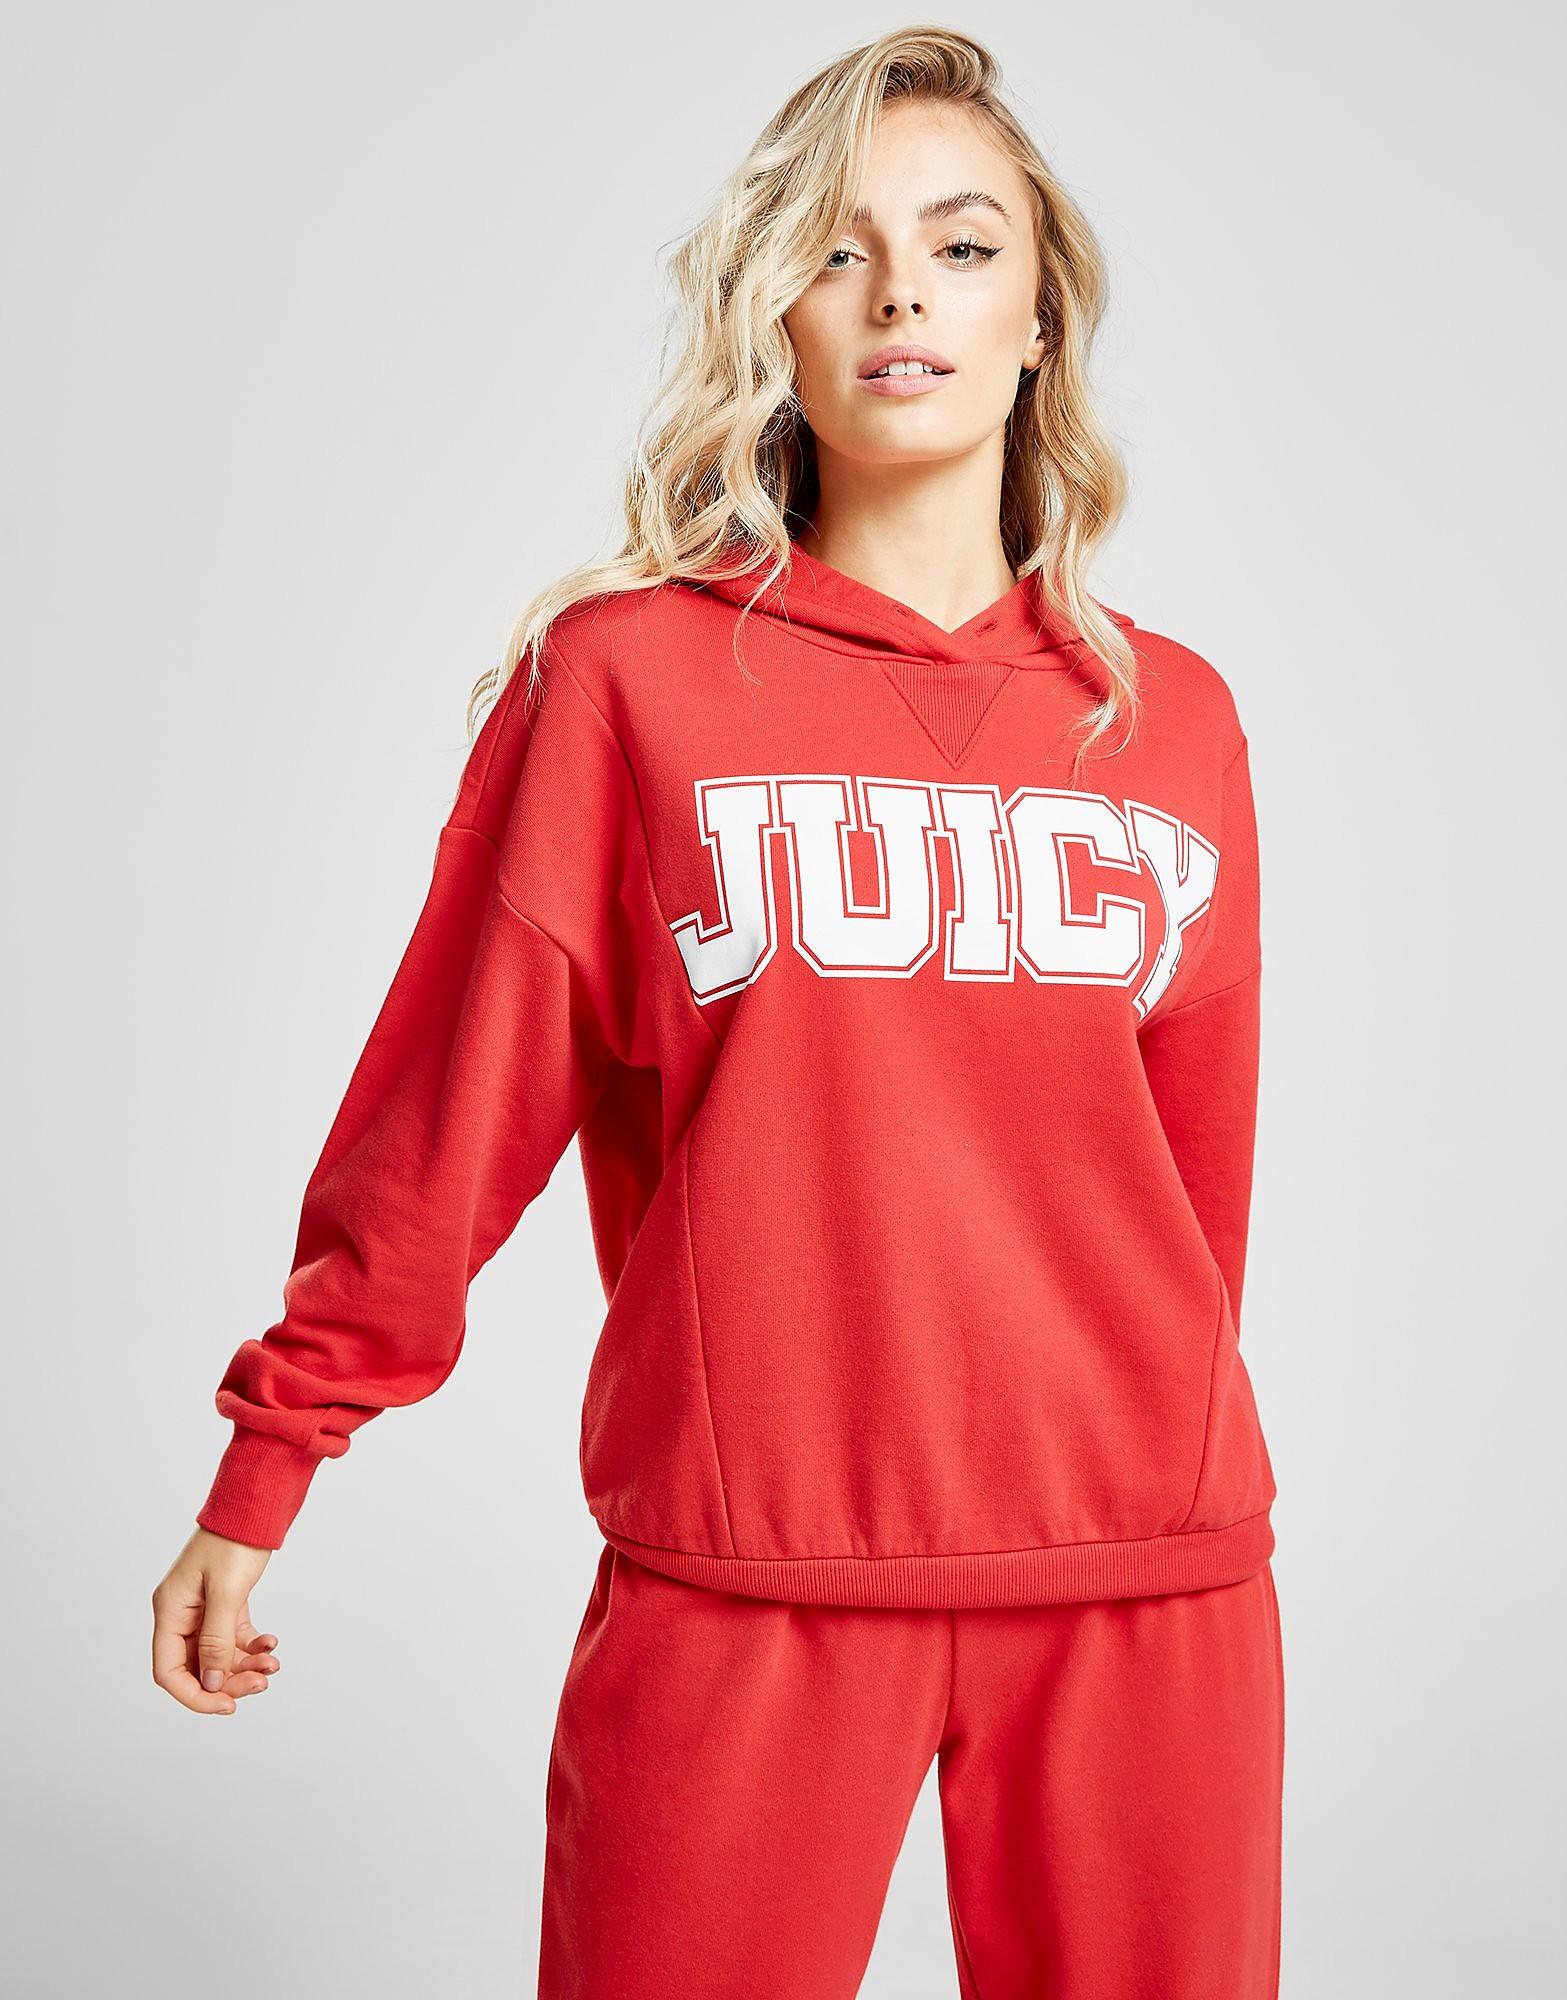 Juicy by Juicy Couture Collegiate Hoodie Dames - alleen bij JD - Rood - Dames